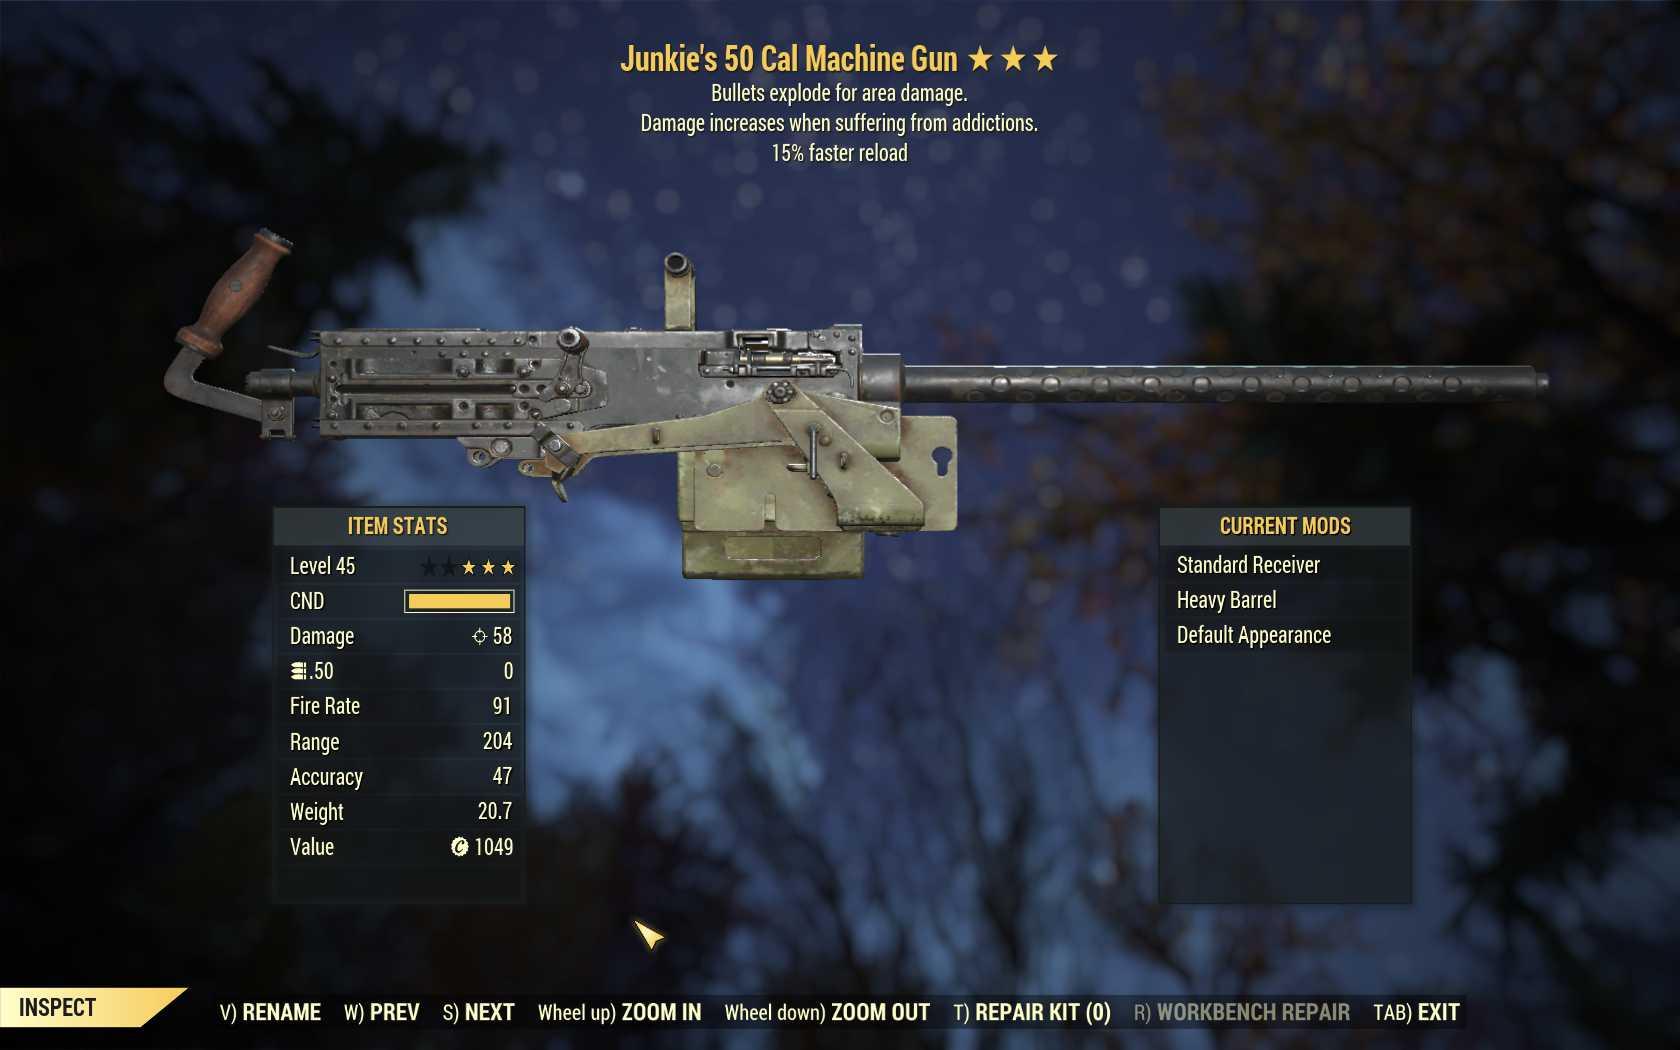 Junkie's 50 Cal Machine Gun (25% faster fire rate, 15% faster reload)